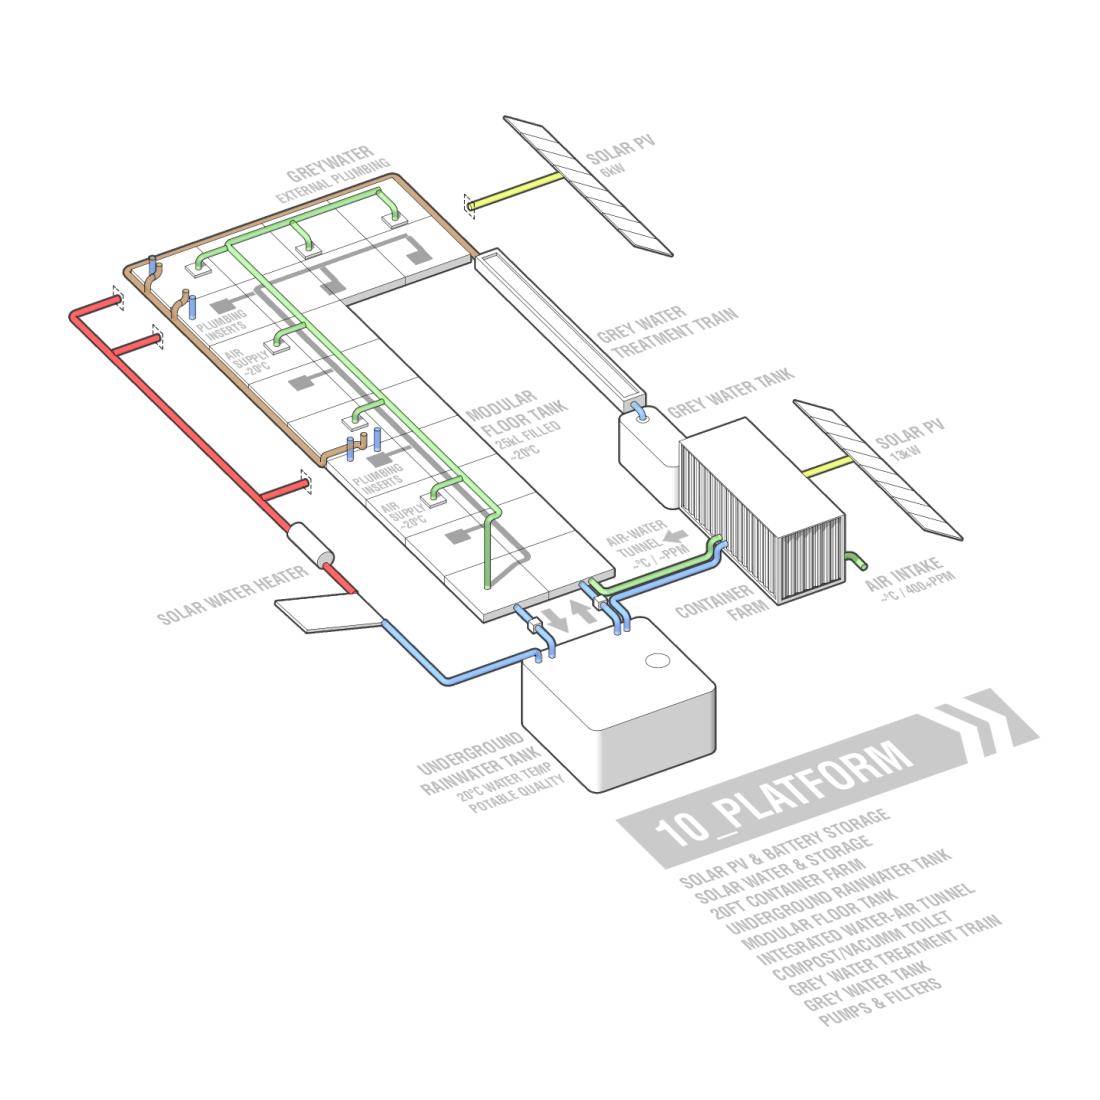 Diagrammatics - Platform (initial synthesis) 10